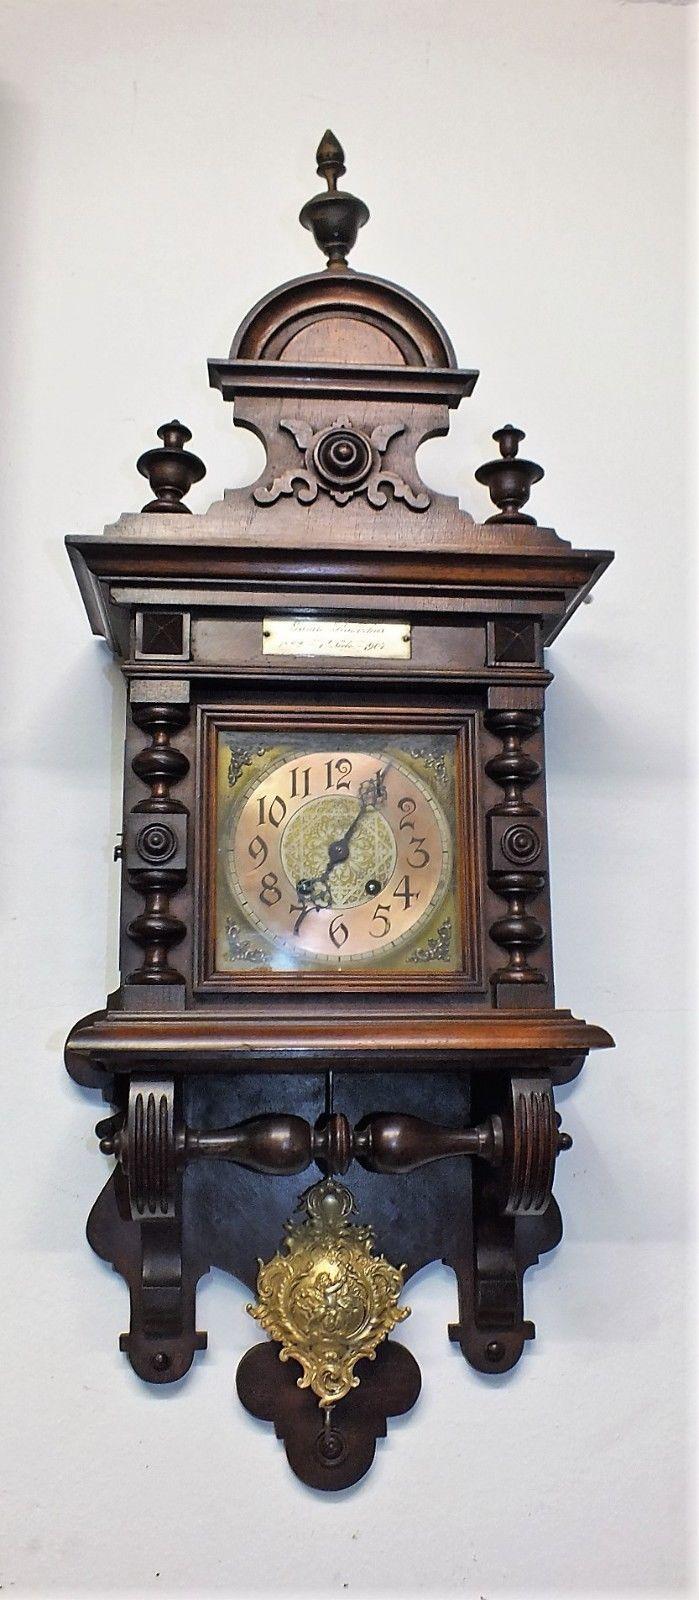 Horloge De Bureau Originale 95cm hoch originale lenzkirch agu wanduhr freuischwinger